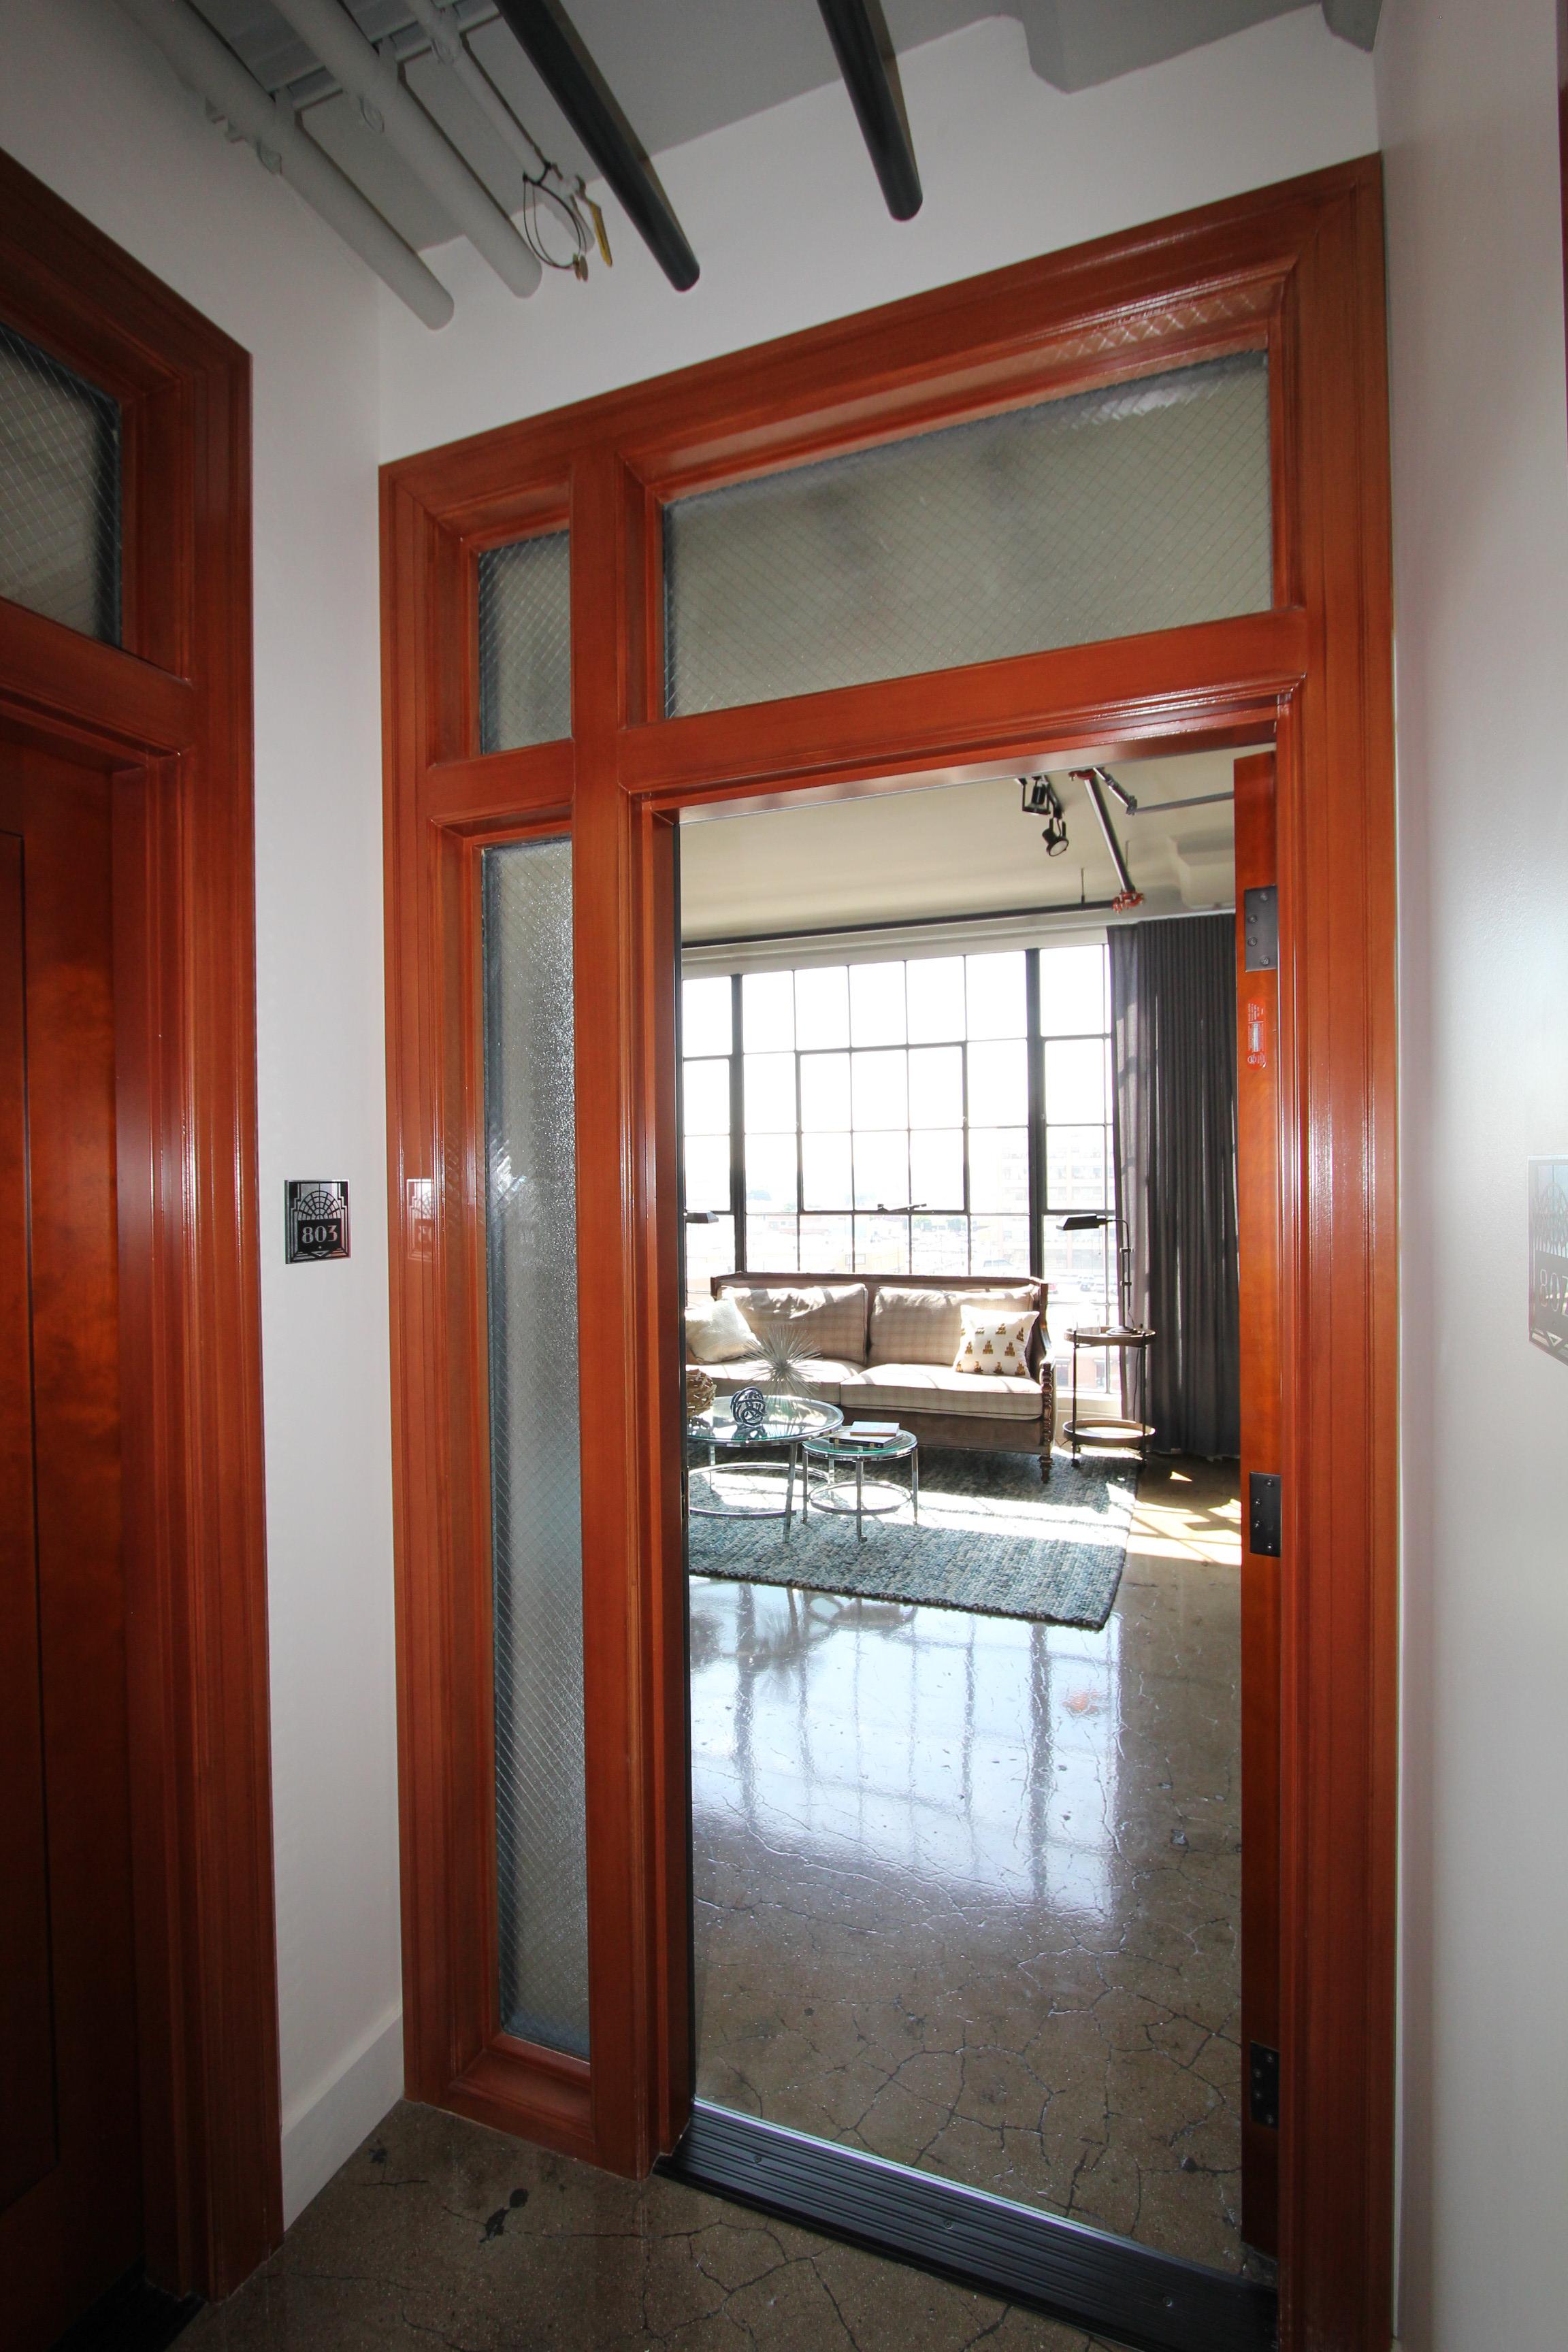 Interior wood door to unit, after rehabilitation.